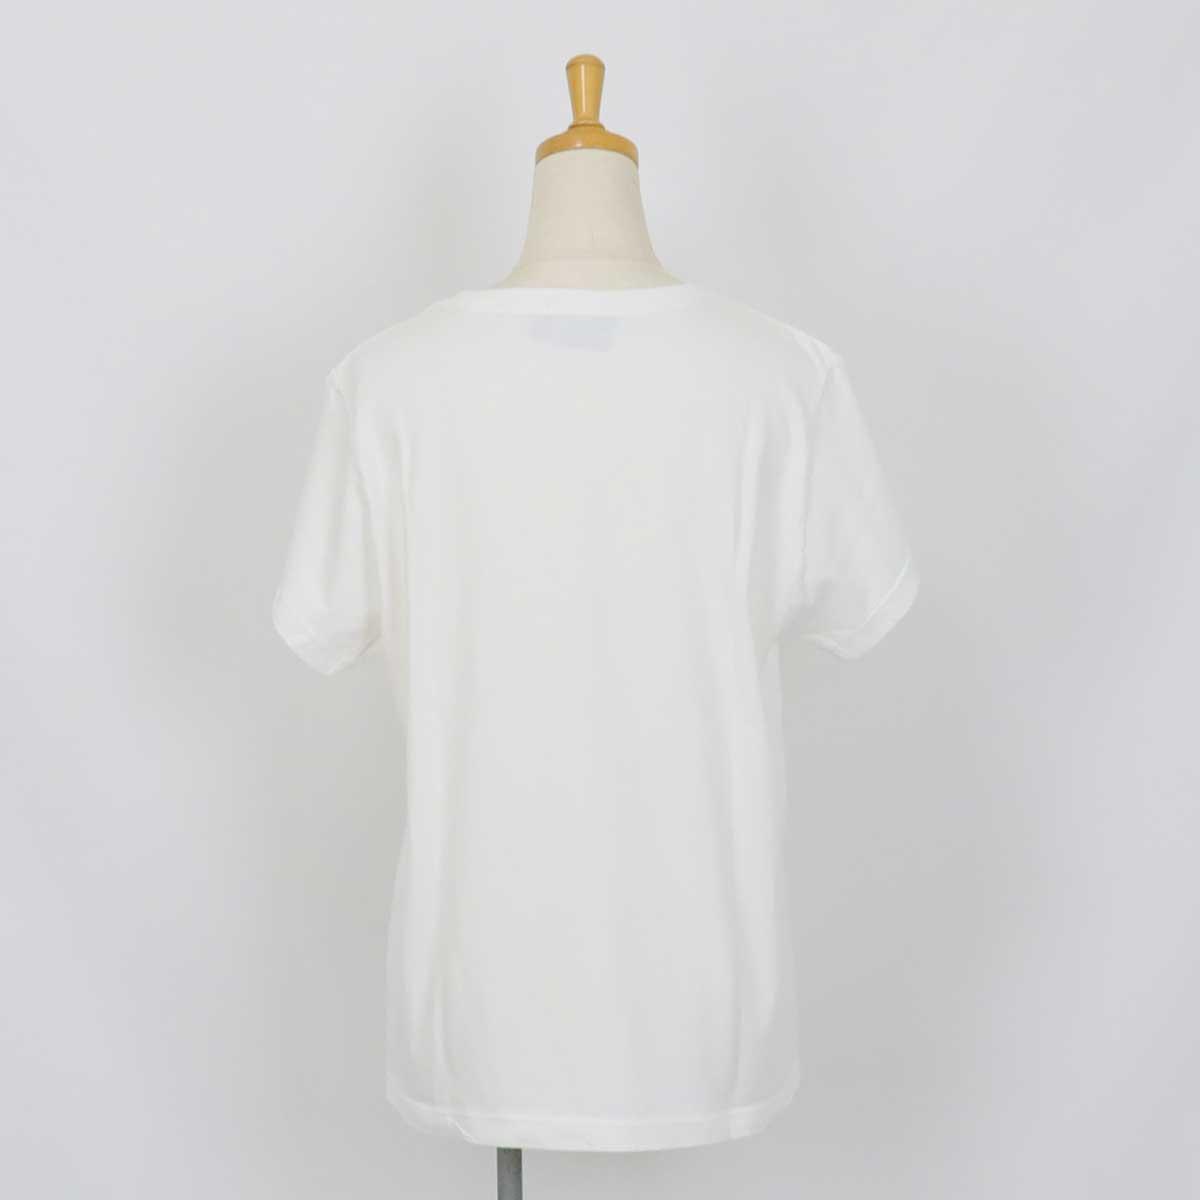 ≪SALE・20パーセントオフ≫marble sud マーブルシュッド Tシャツ TAKO de TAKO S/S TEE